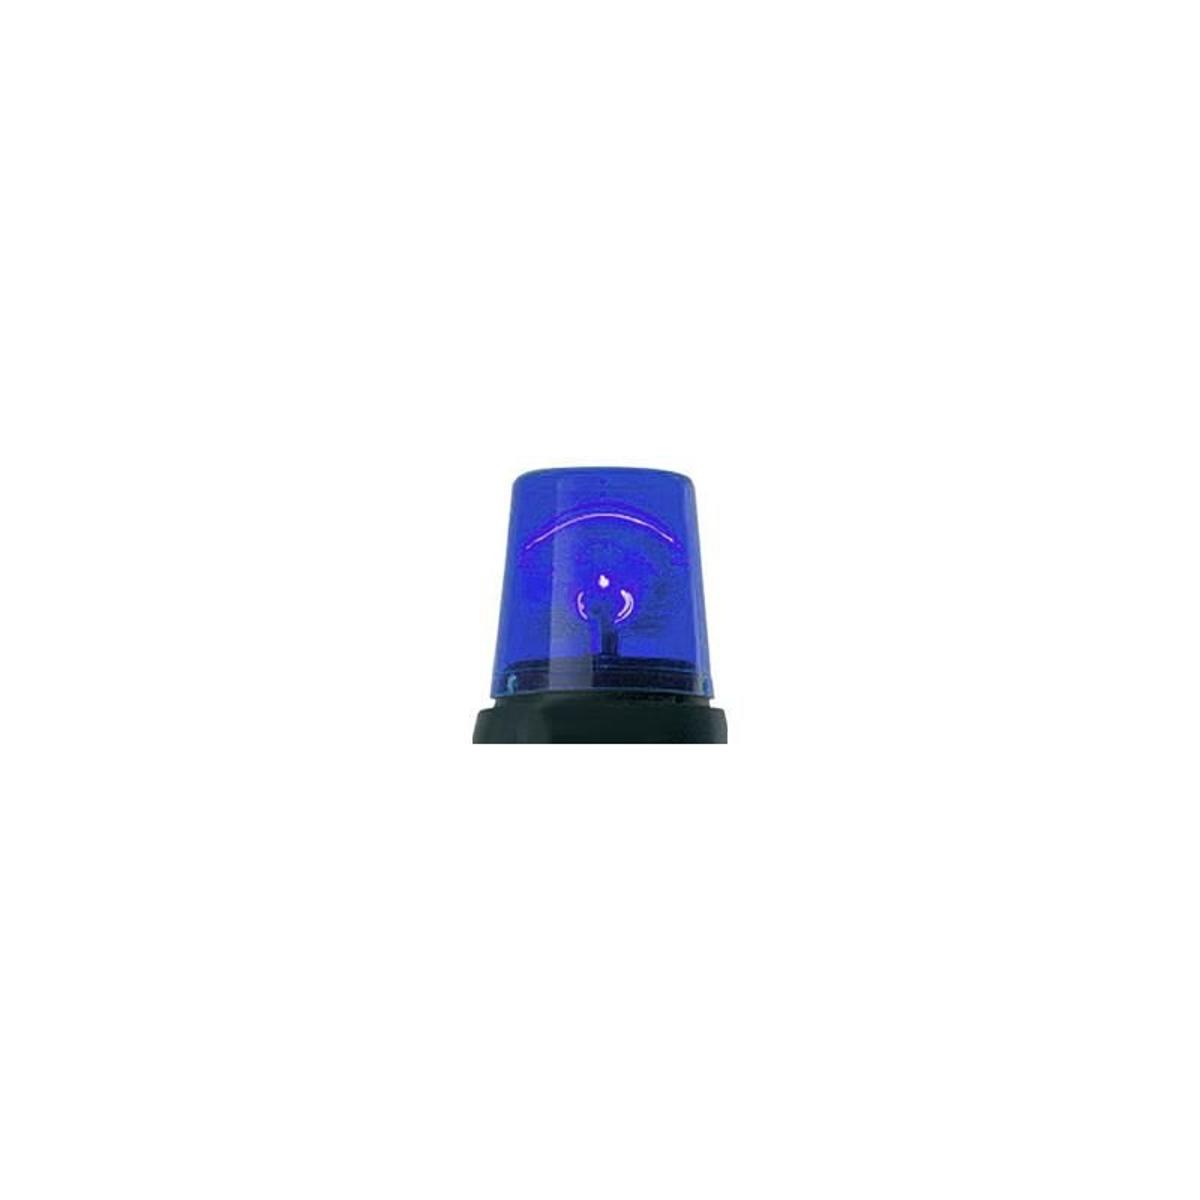 Berg Toys 16.24.20 Coupole de gyrophare bleu